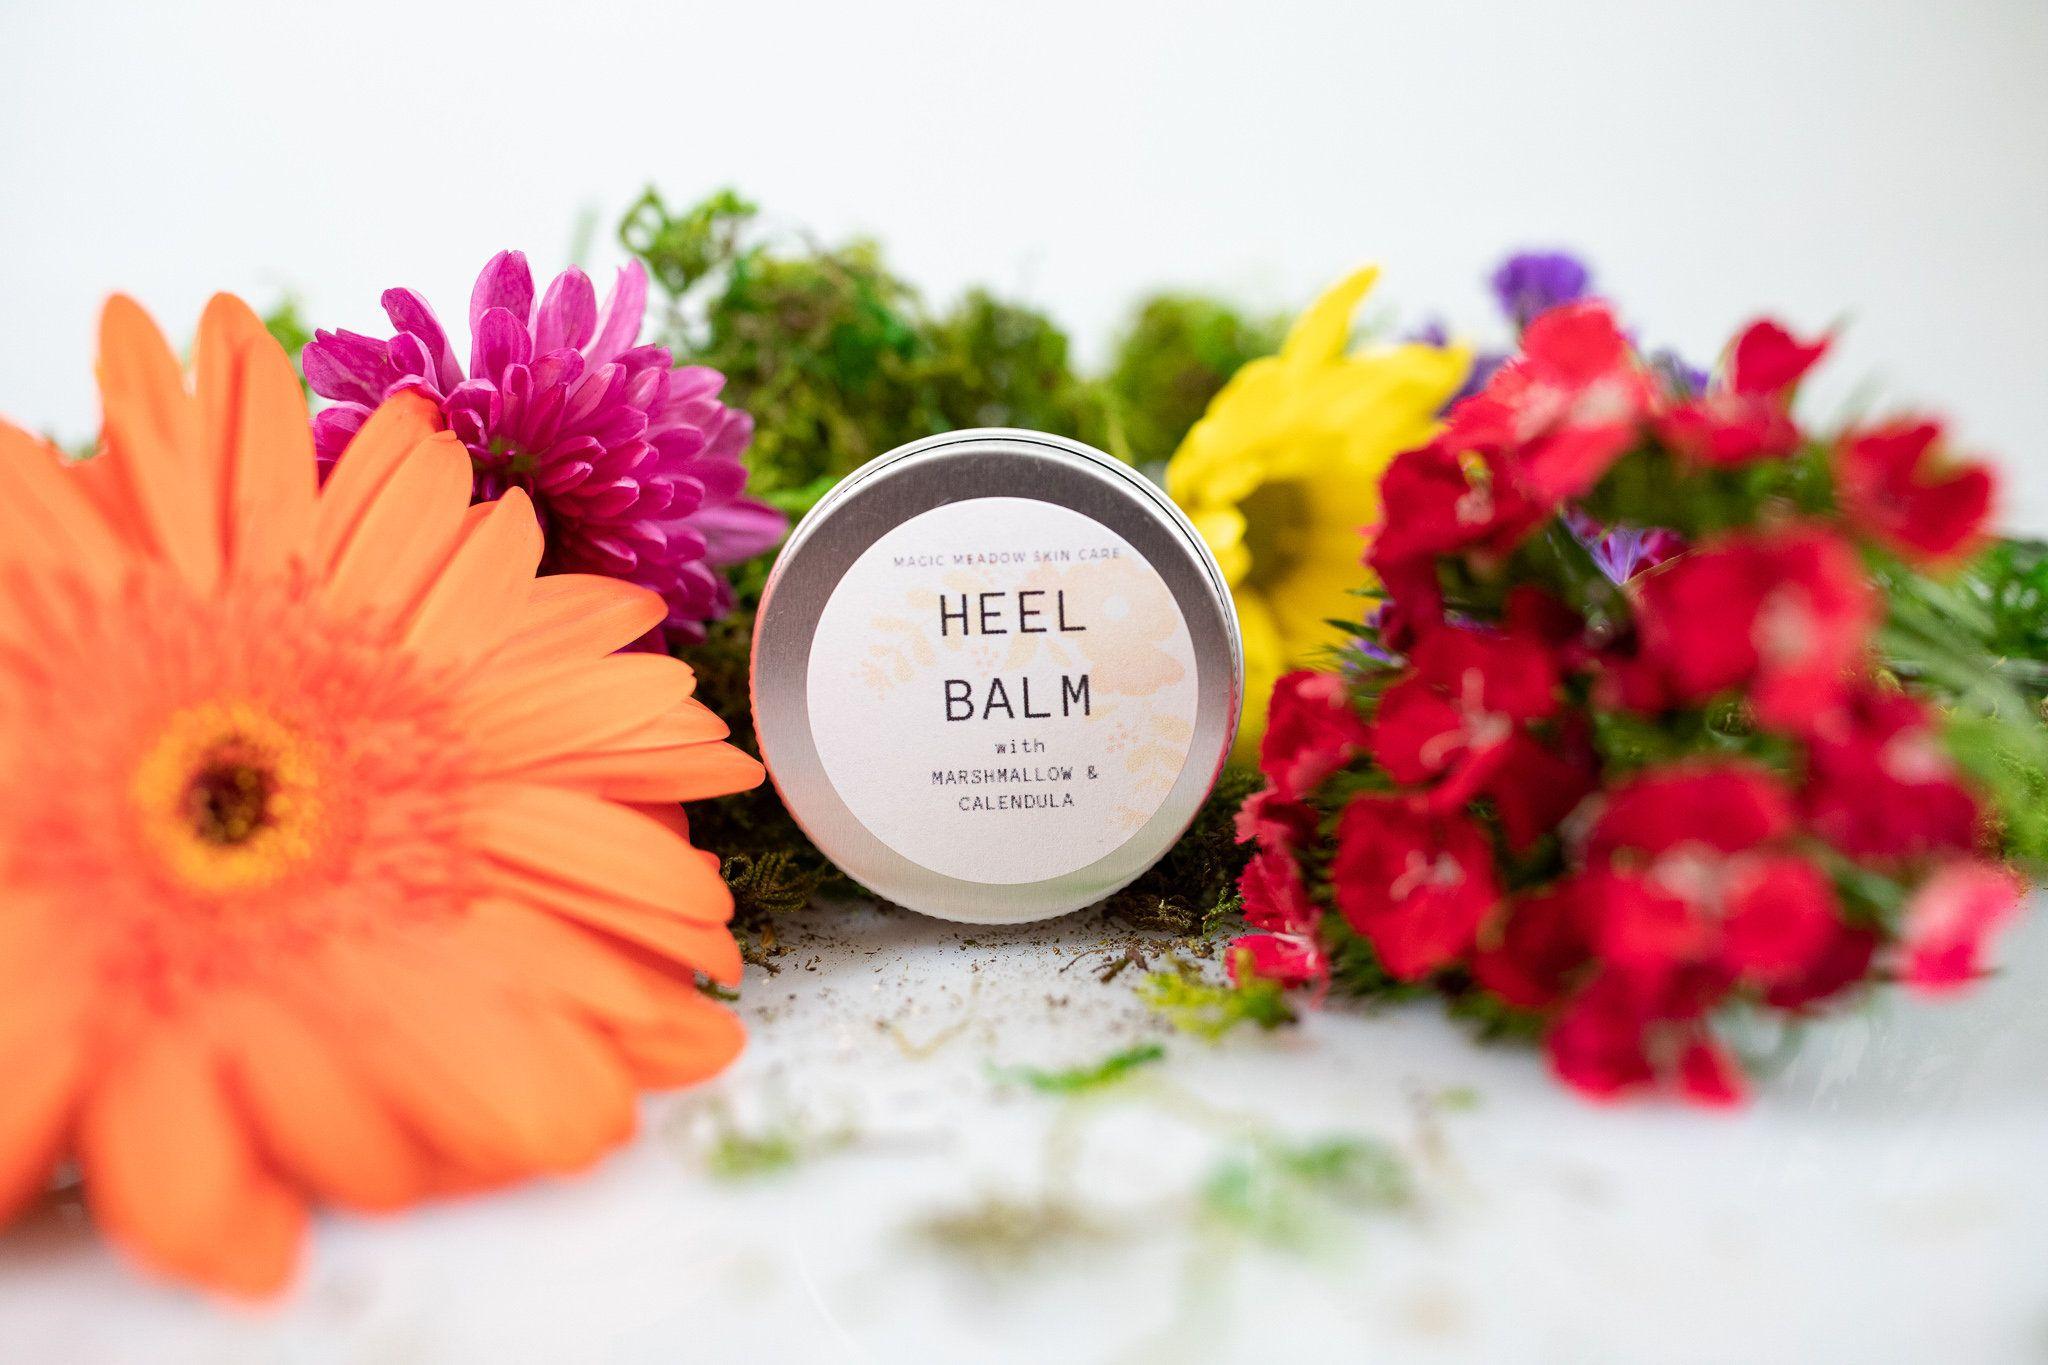 Heel Balm Ultra Moisturizing Balm Dry Cracked Skin Relief